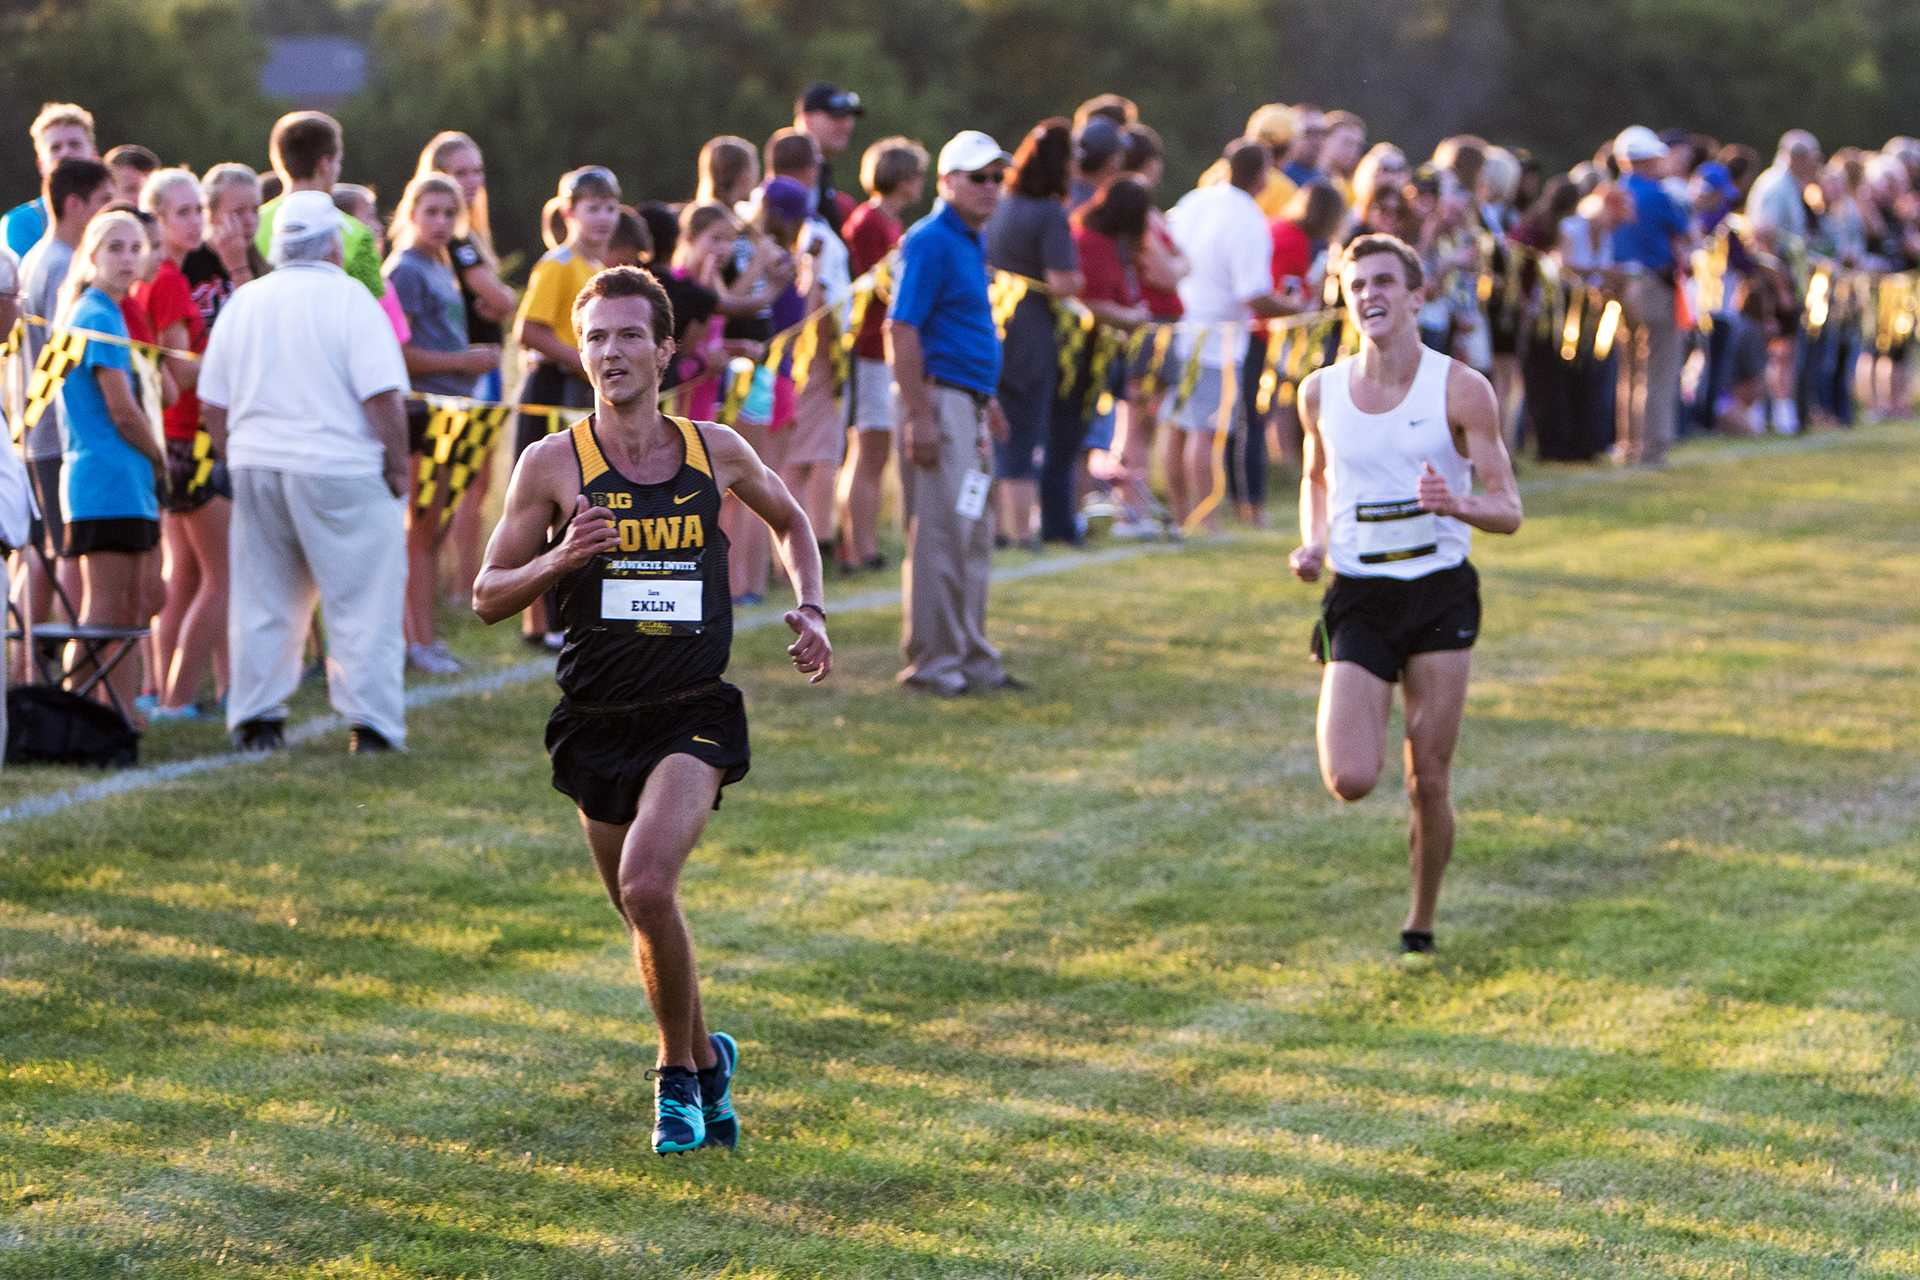 Ian Eklin kicks down a competitor at the finish line at the Hawkeye Invitational Cross Country meet on Friday, September 1, 2017. (David Harmantas/The Daily Iowan)